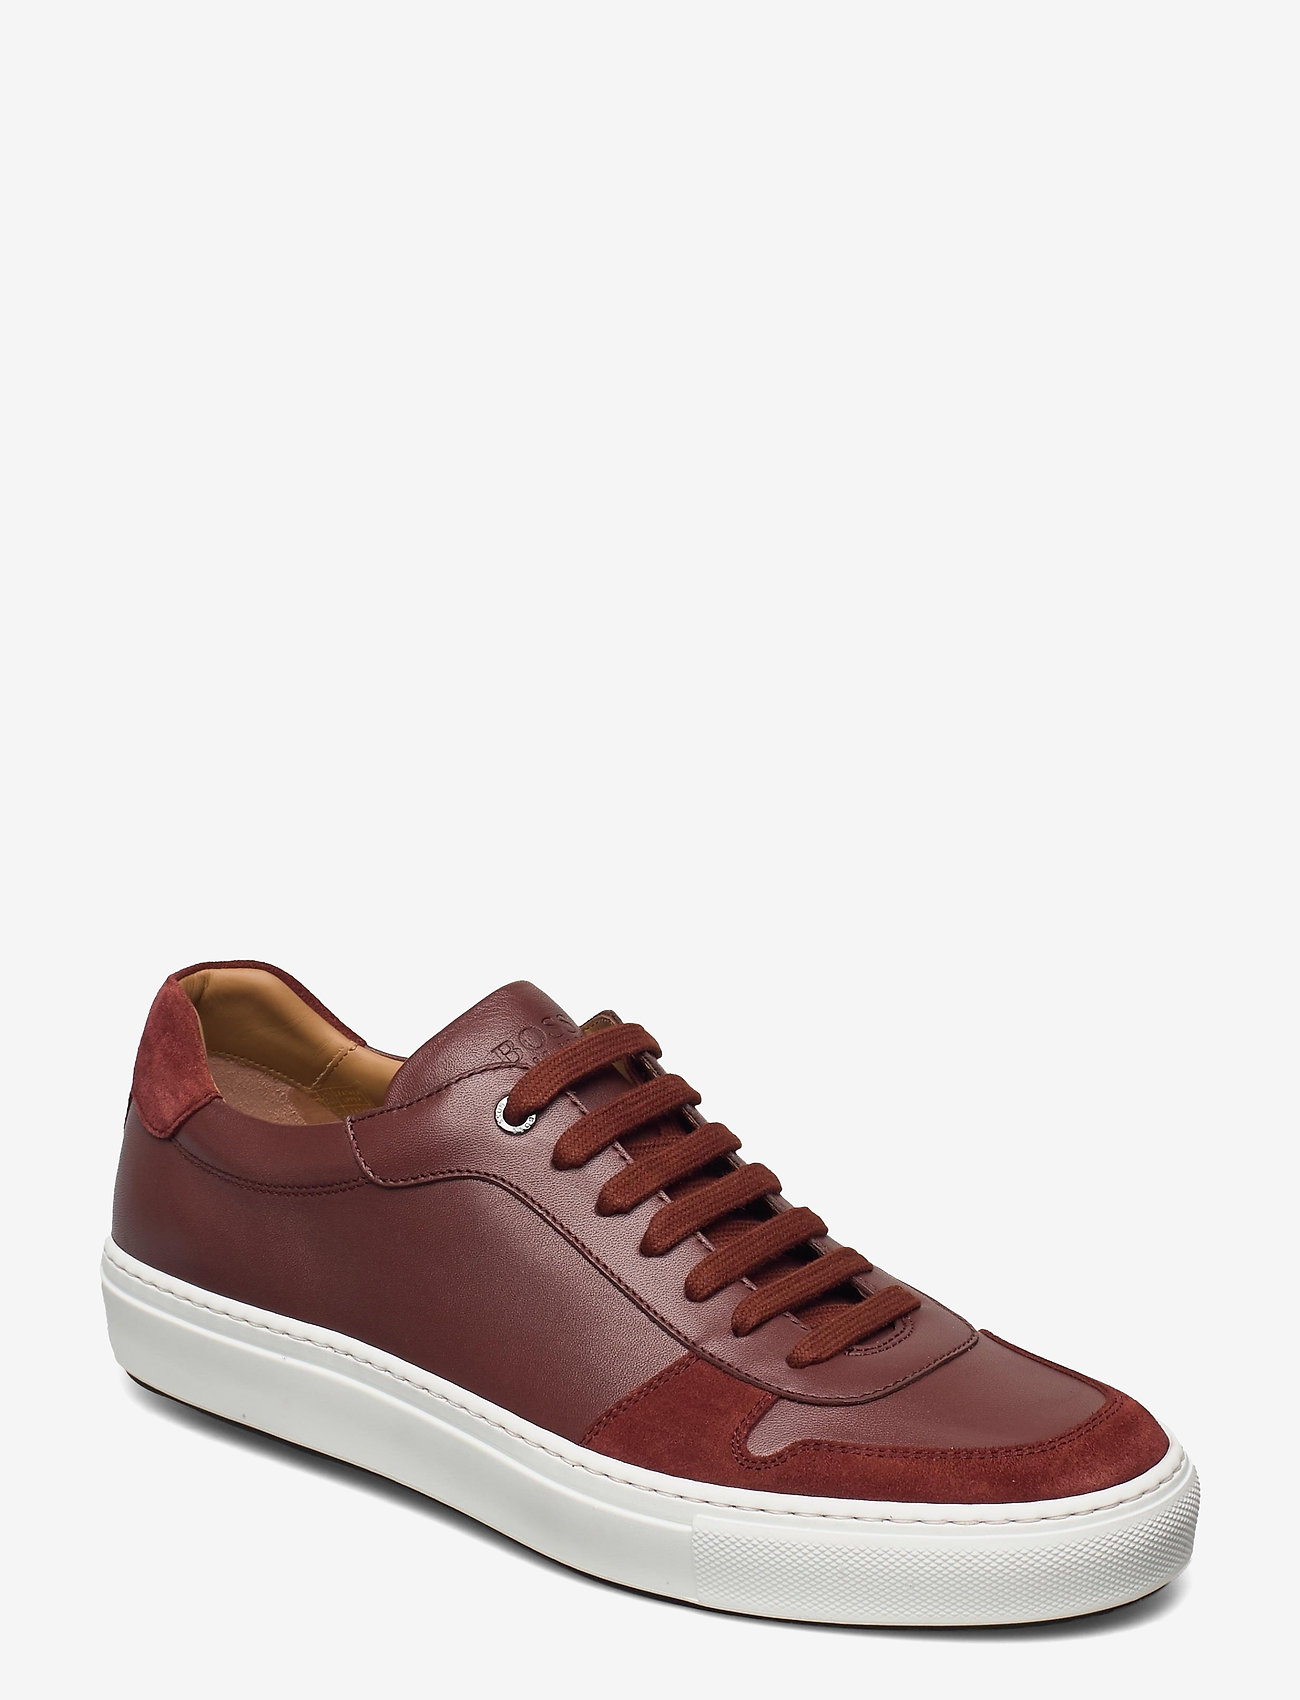 BOSS - Mirage_Tenn_oxns - låga sneakers - rust/copper - 1